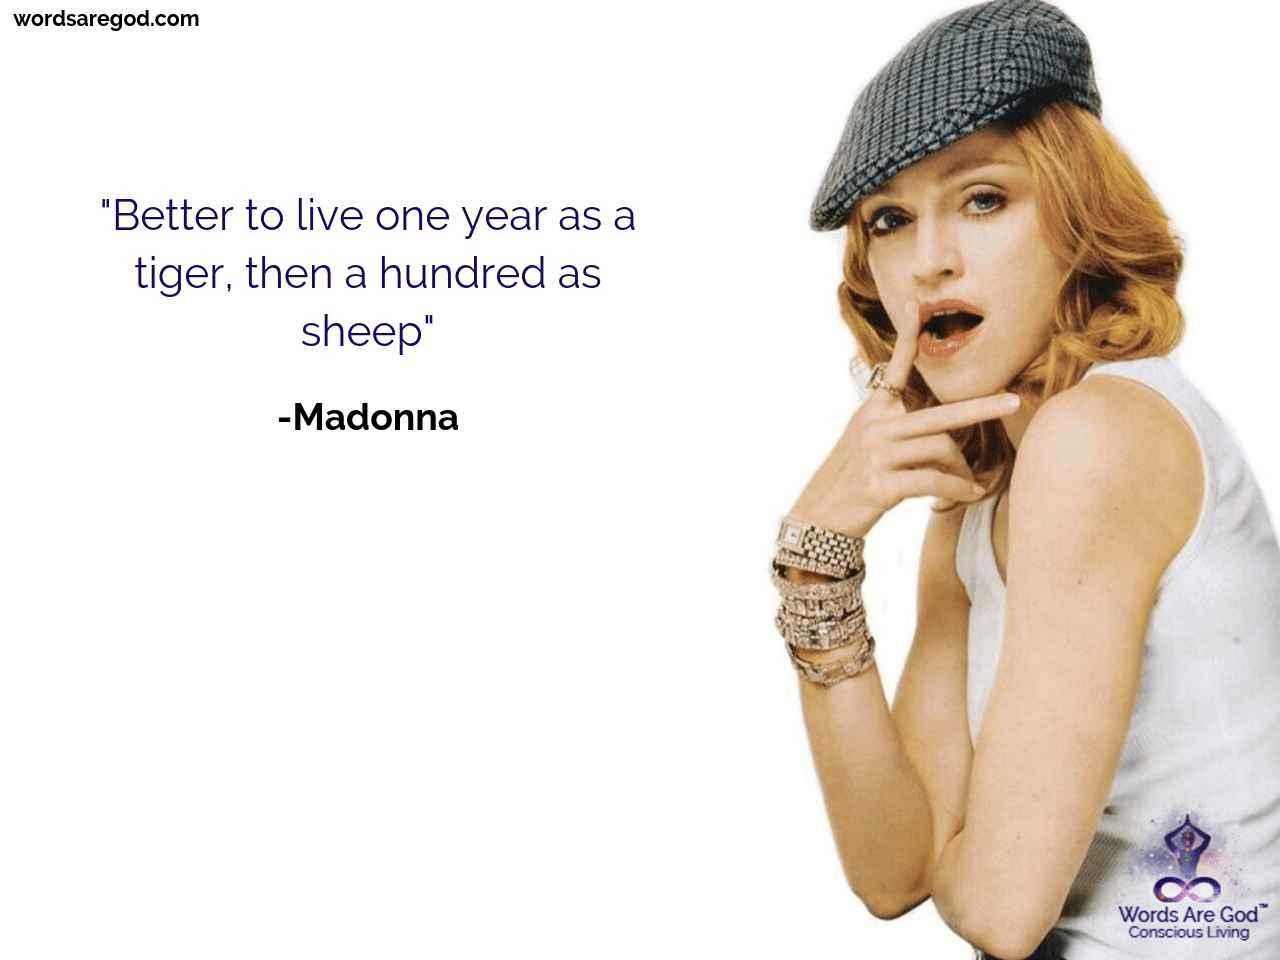 Madonna Inspirational Quote